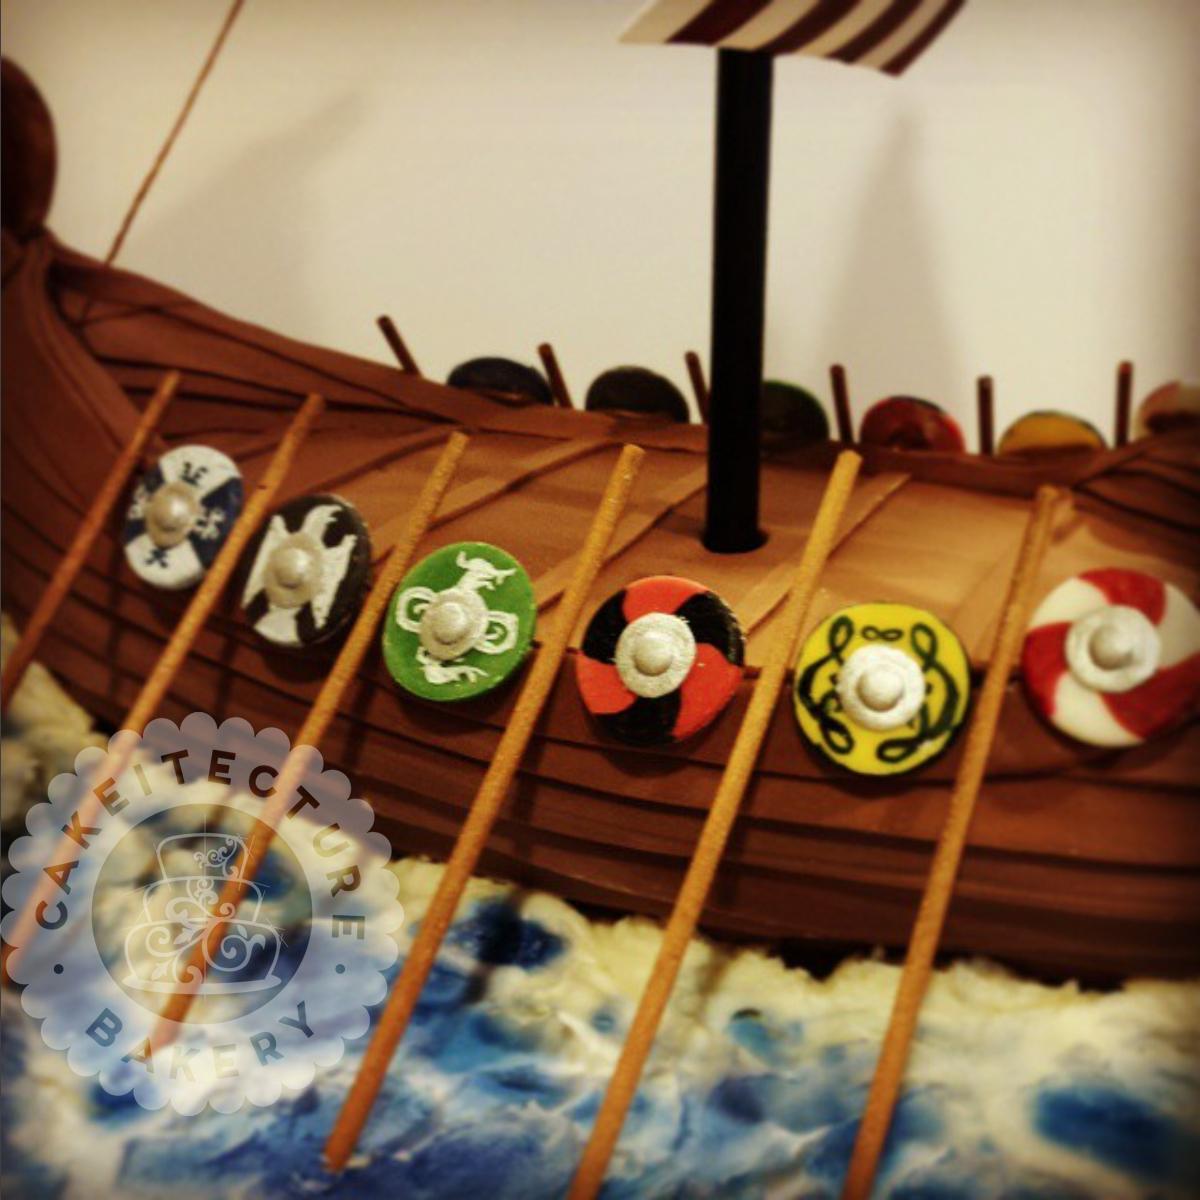 Cakeitecture Bakery viking ship2.jpg